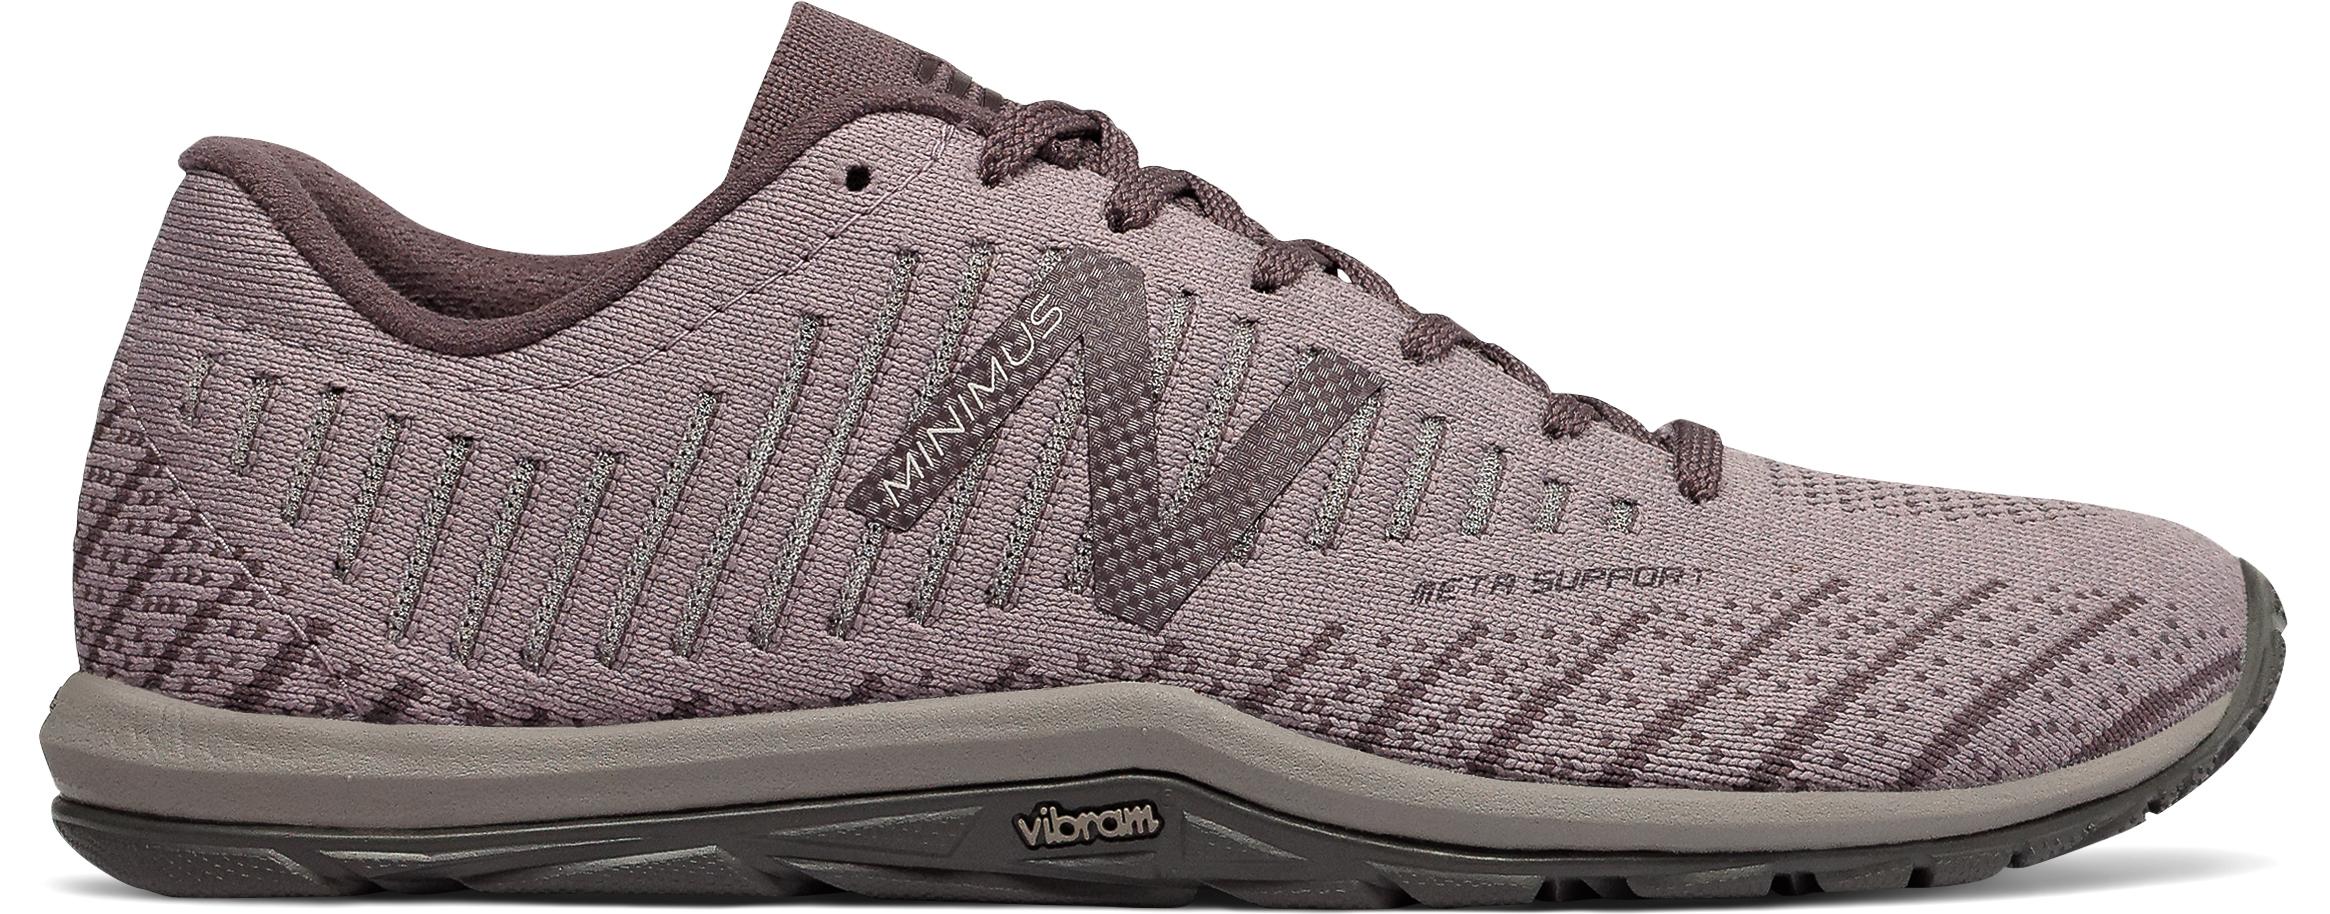 newest 02057 f8e8f New Balance women's shoes | MEC